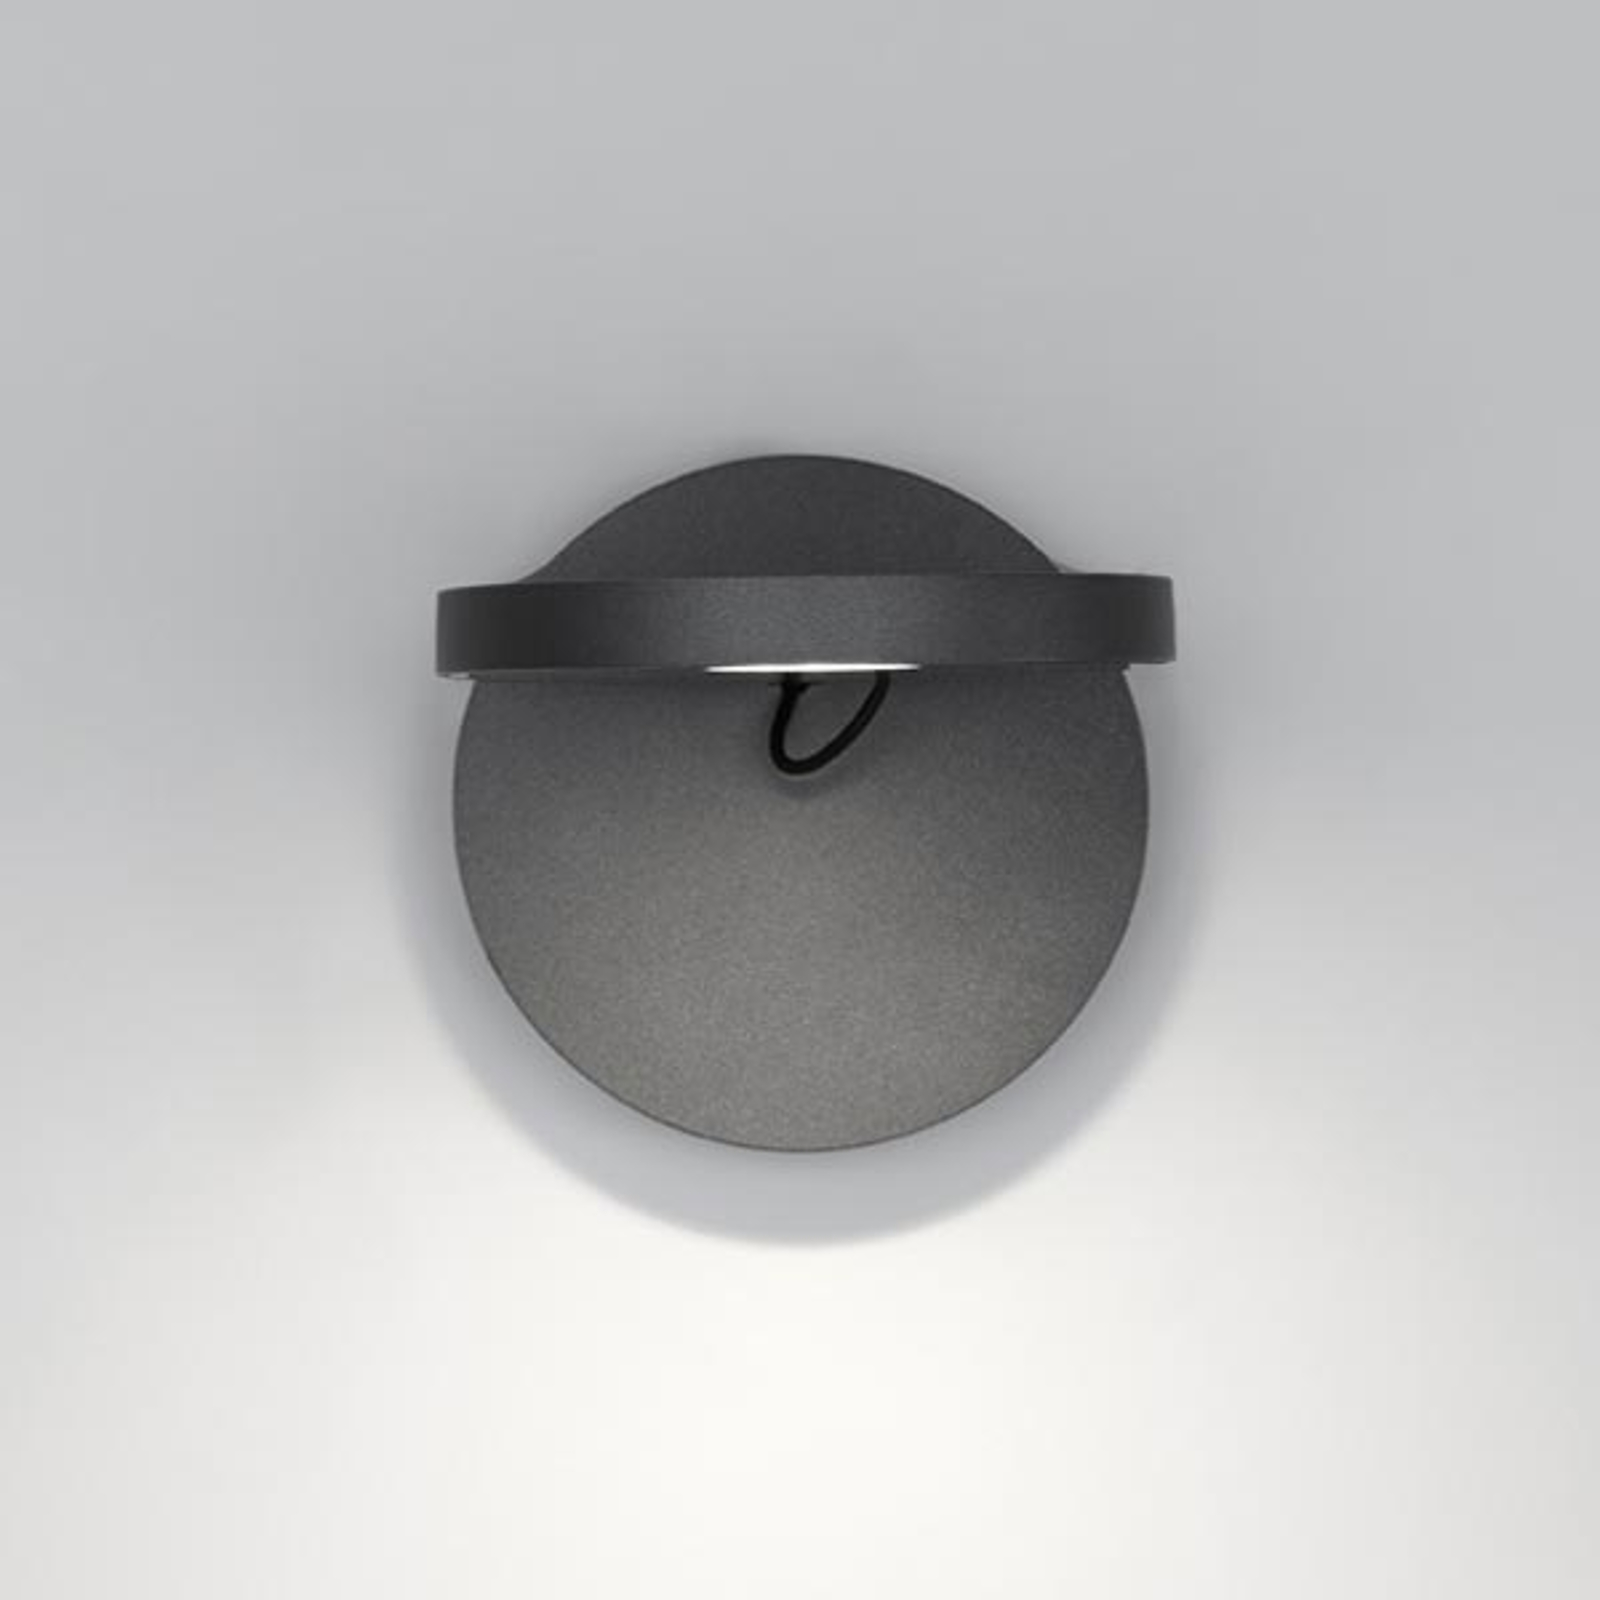 Artemide Demetra Spotlight - LED-Wandleuchte